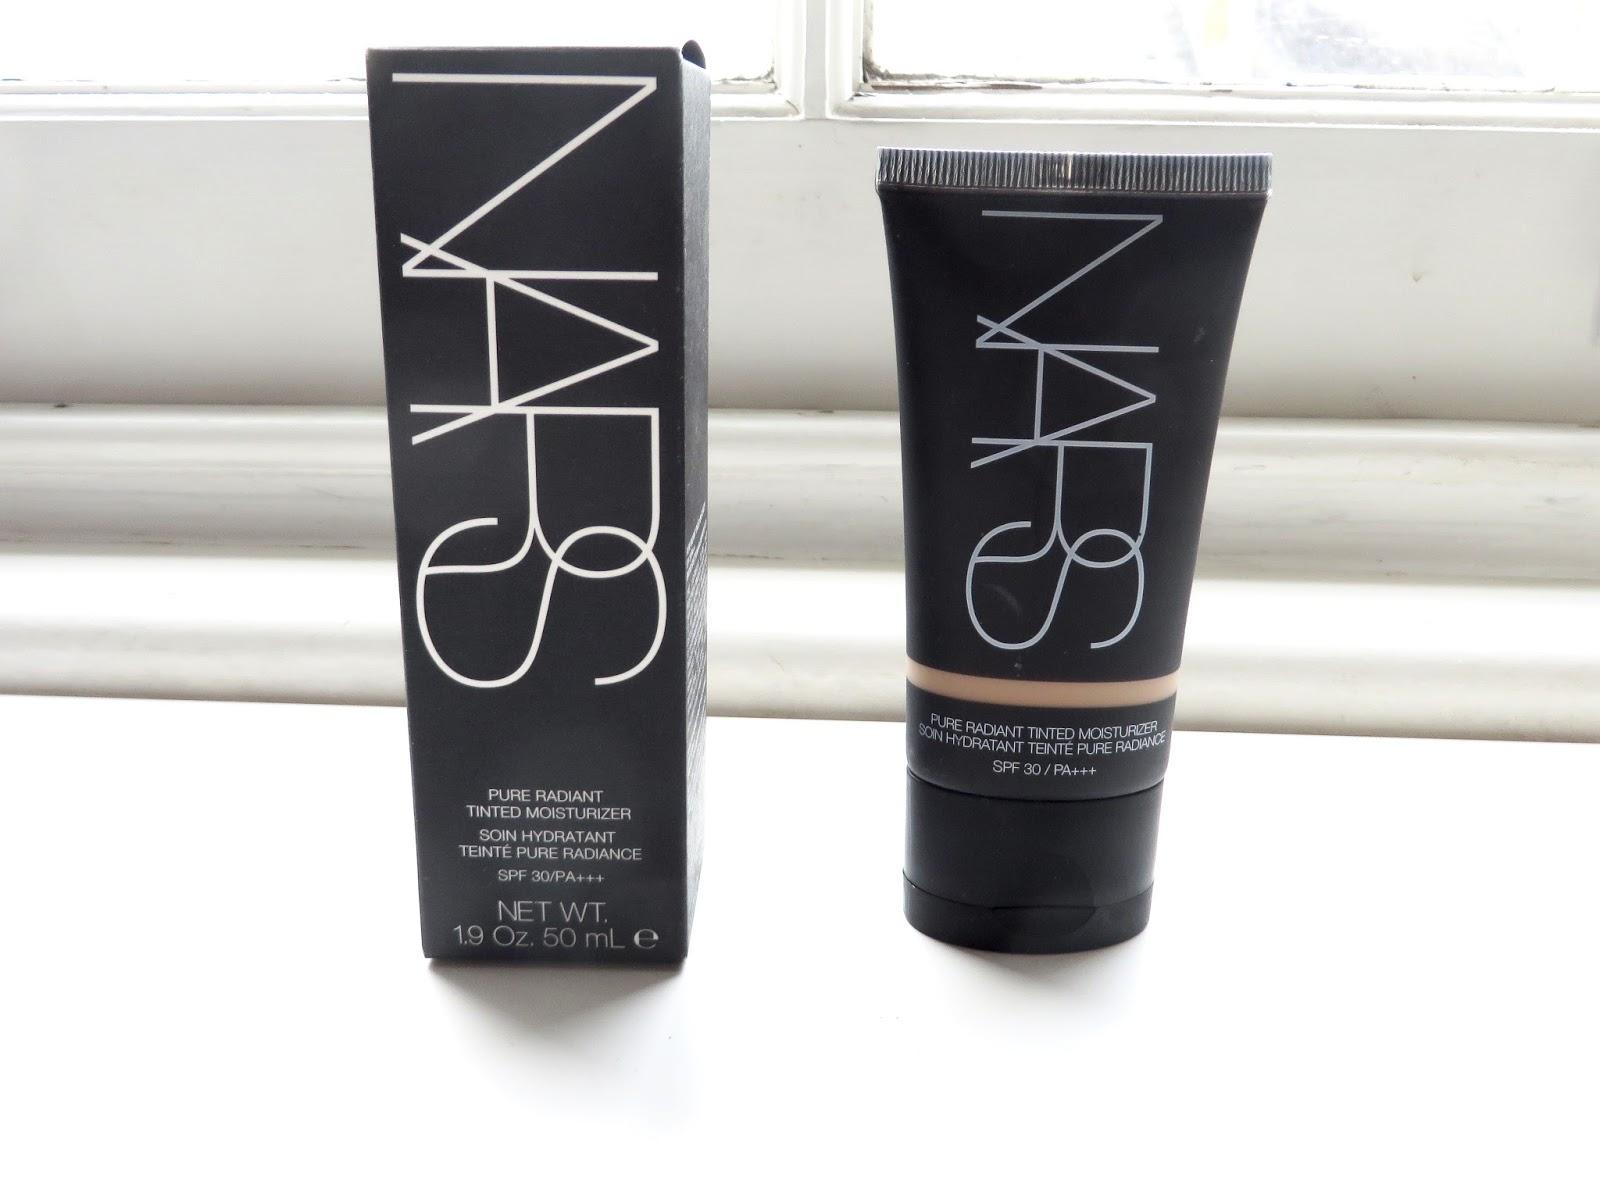 nars, nars foundation, nars beauty, nars creamy radiant concealer, nars st mortiz